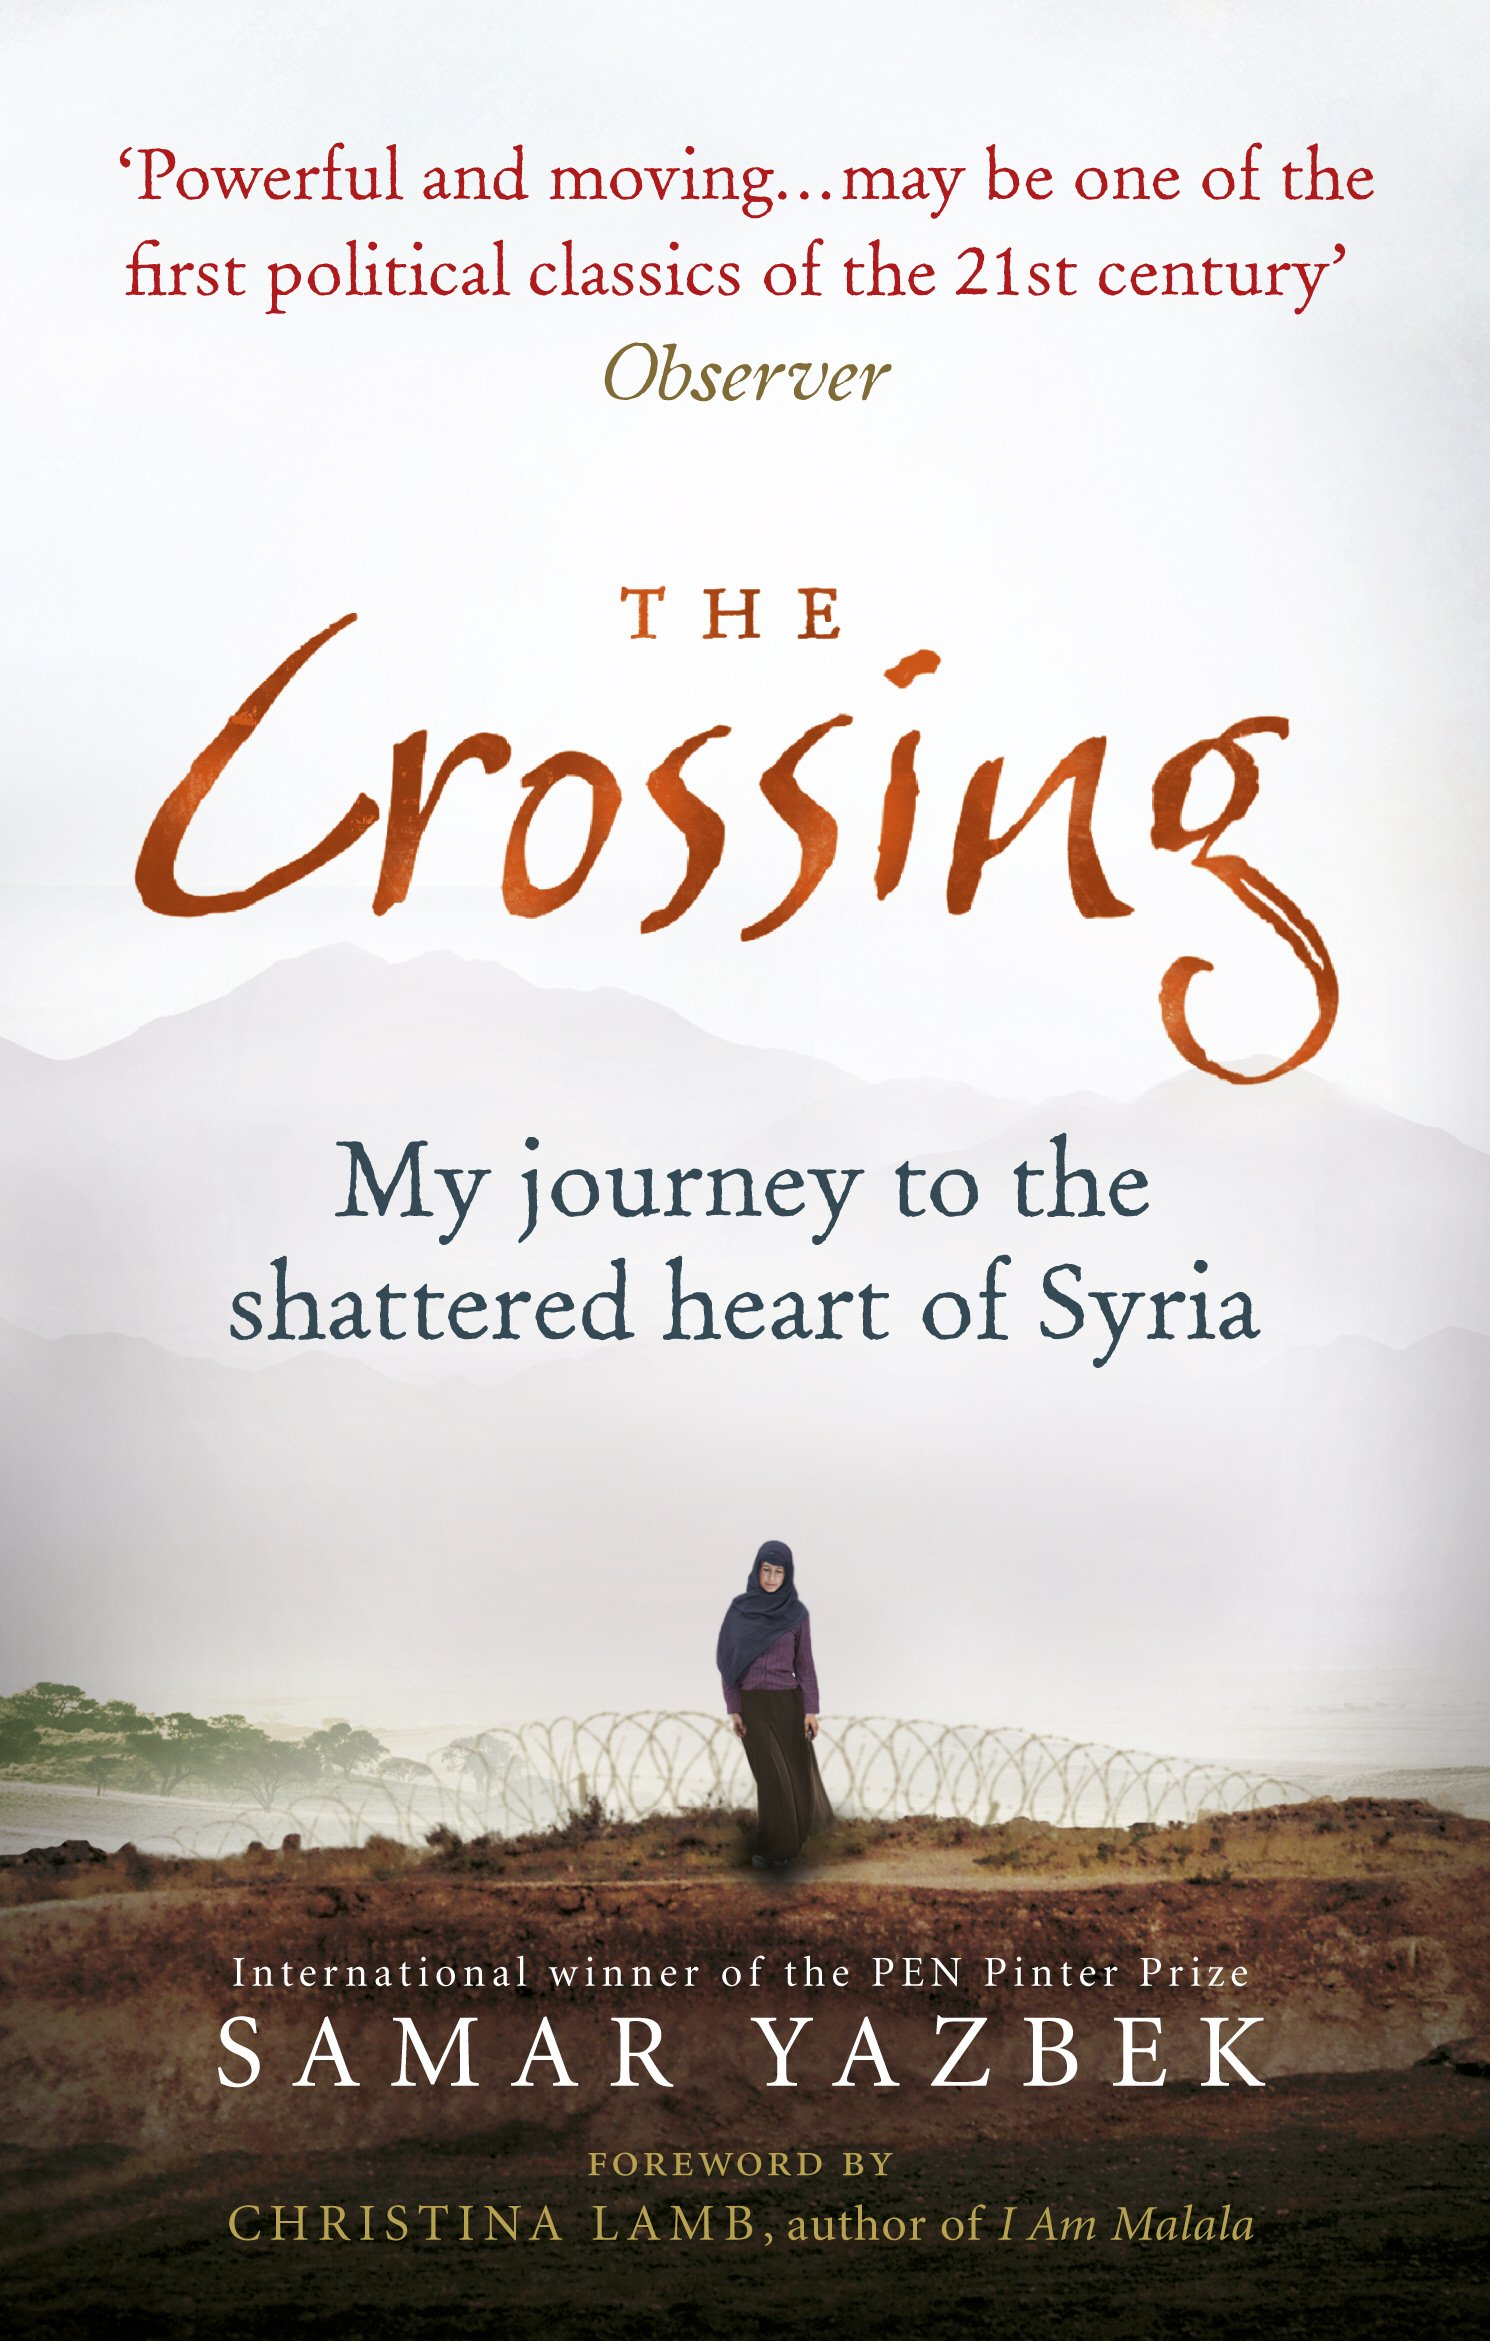 The Crossing My Journey To Shattered Heart Of Syria Samar Yazbek Nashwa Gowanlock Ruth Ahmedzai Kemp Christina Lamb 9781846044885 Amazon